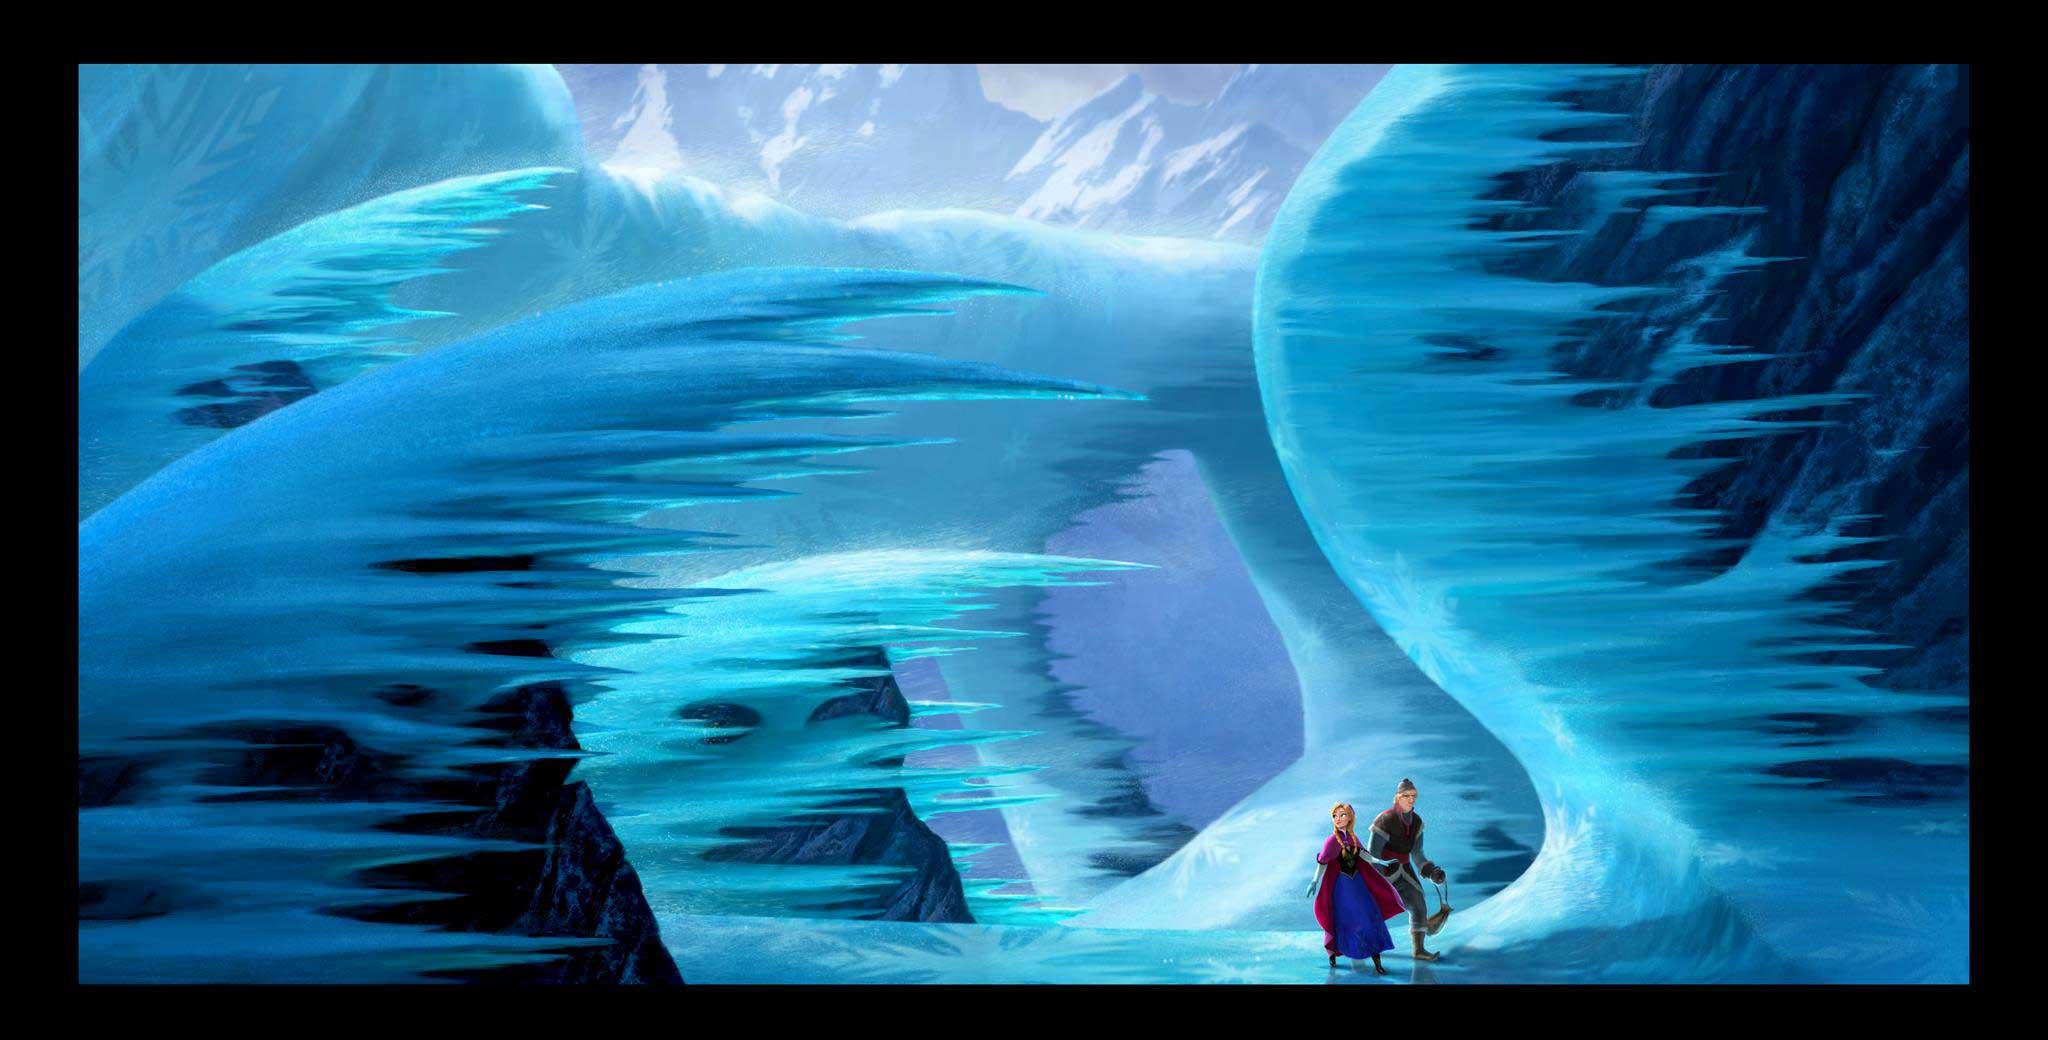 backgrounds anna frozen movie wallpapers free disney wallpapersjpg 2048x1040